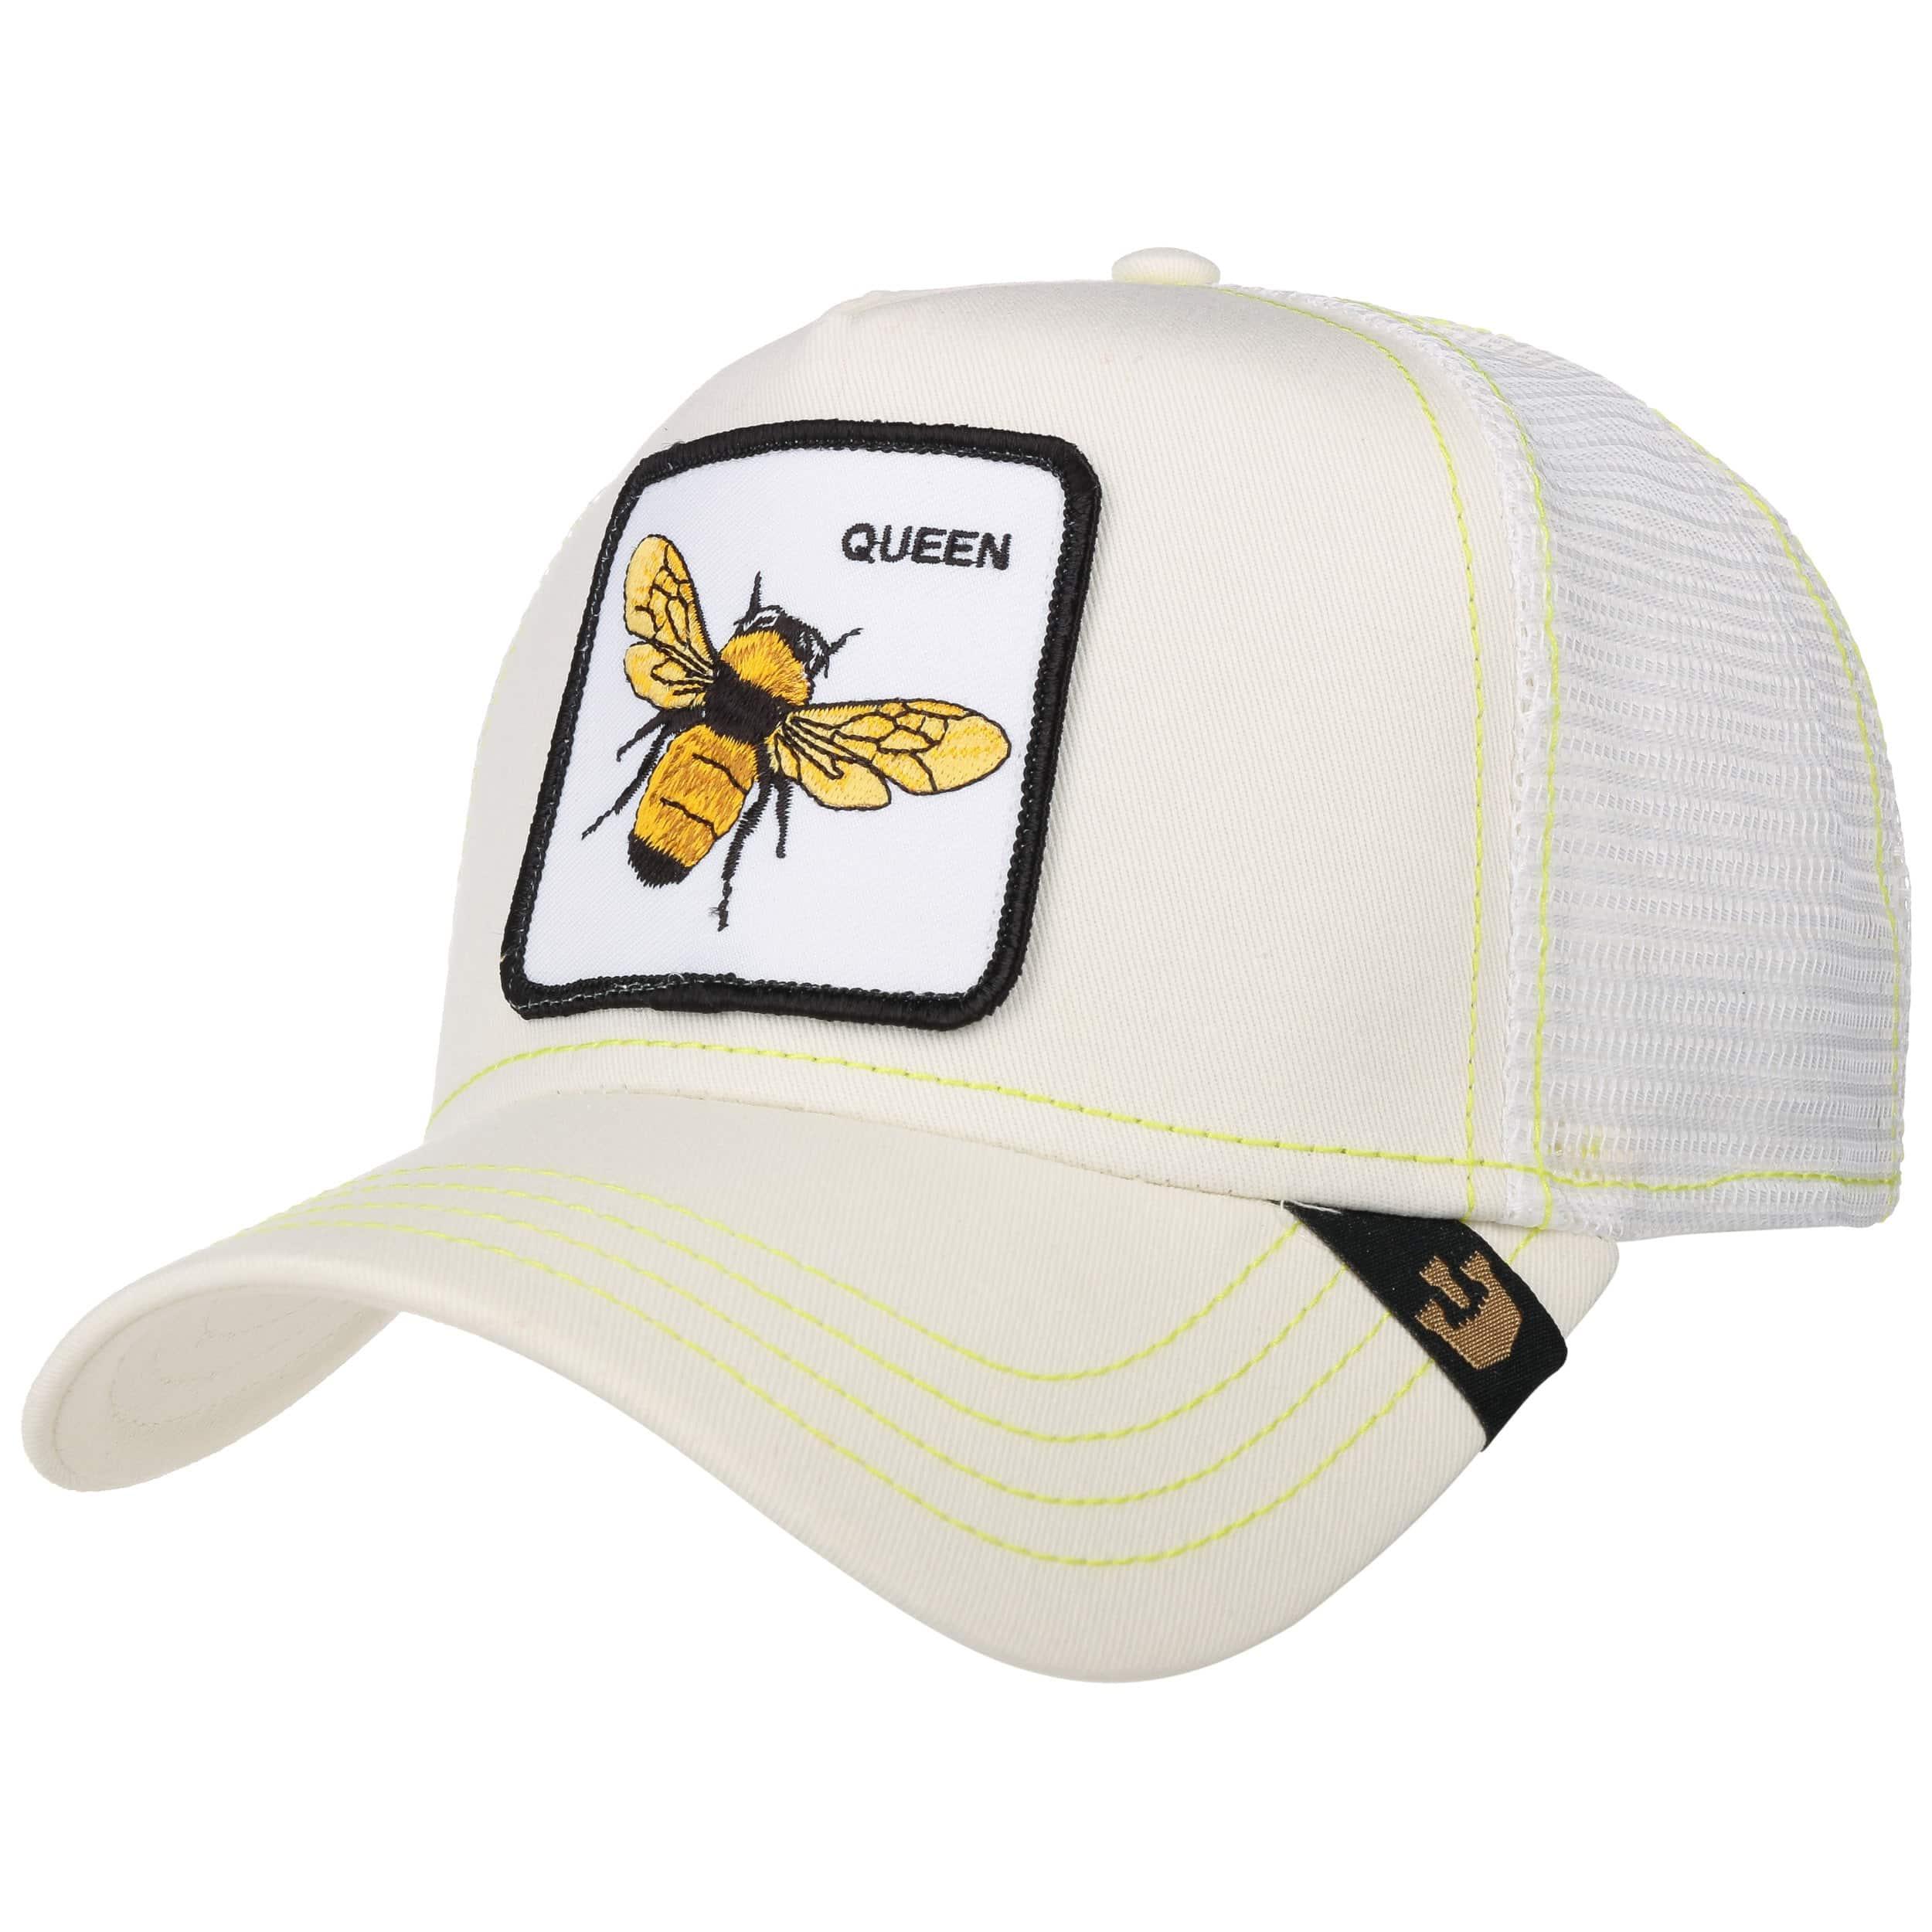 761c3aa424926f white 4 · Queen Bee Trucker Cap by Goorin Bros. - white 5